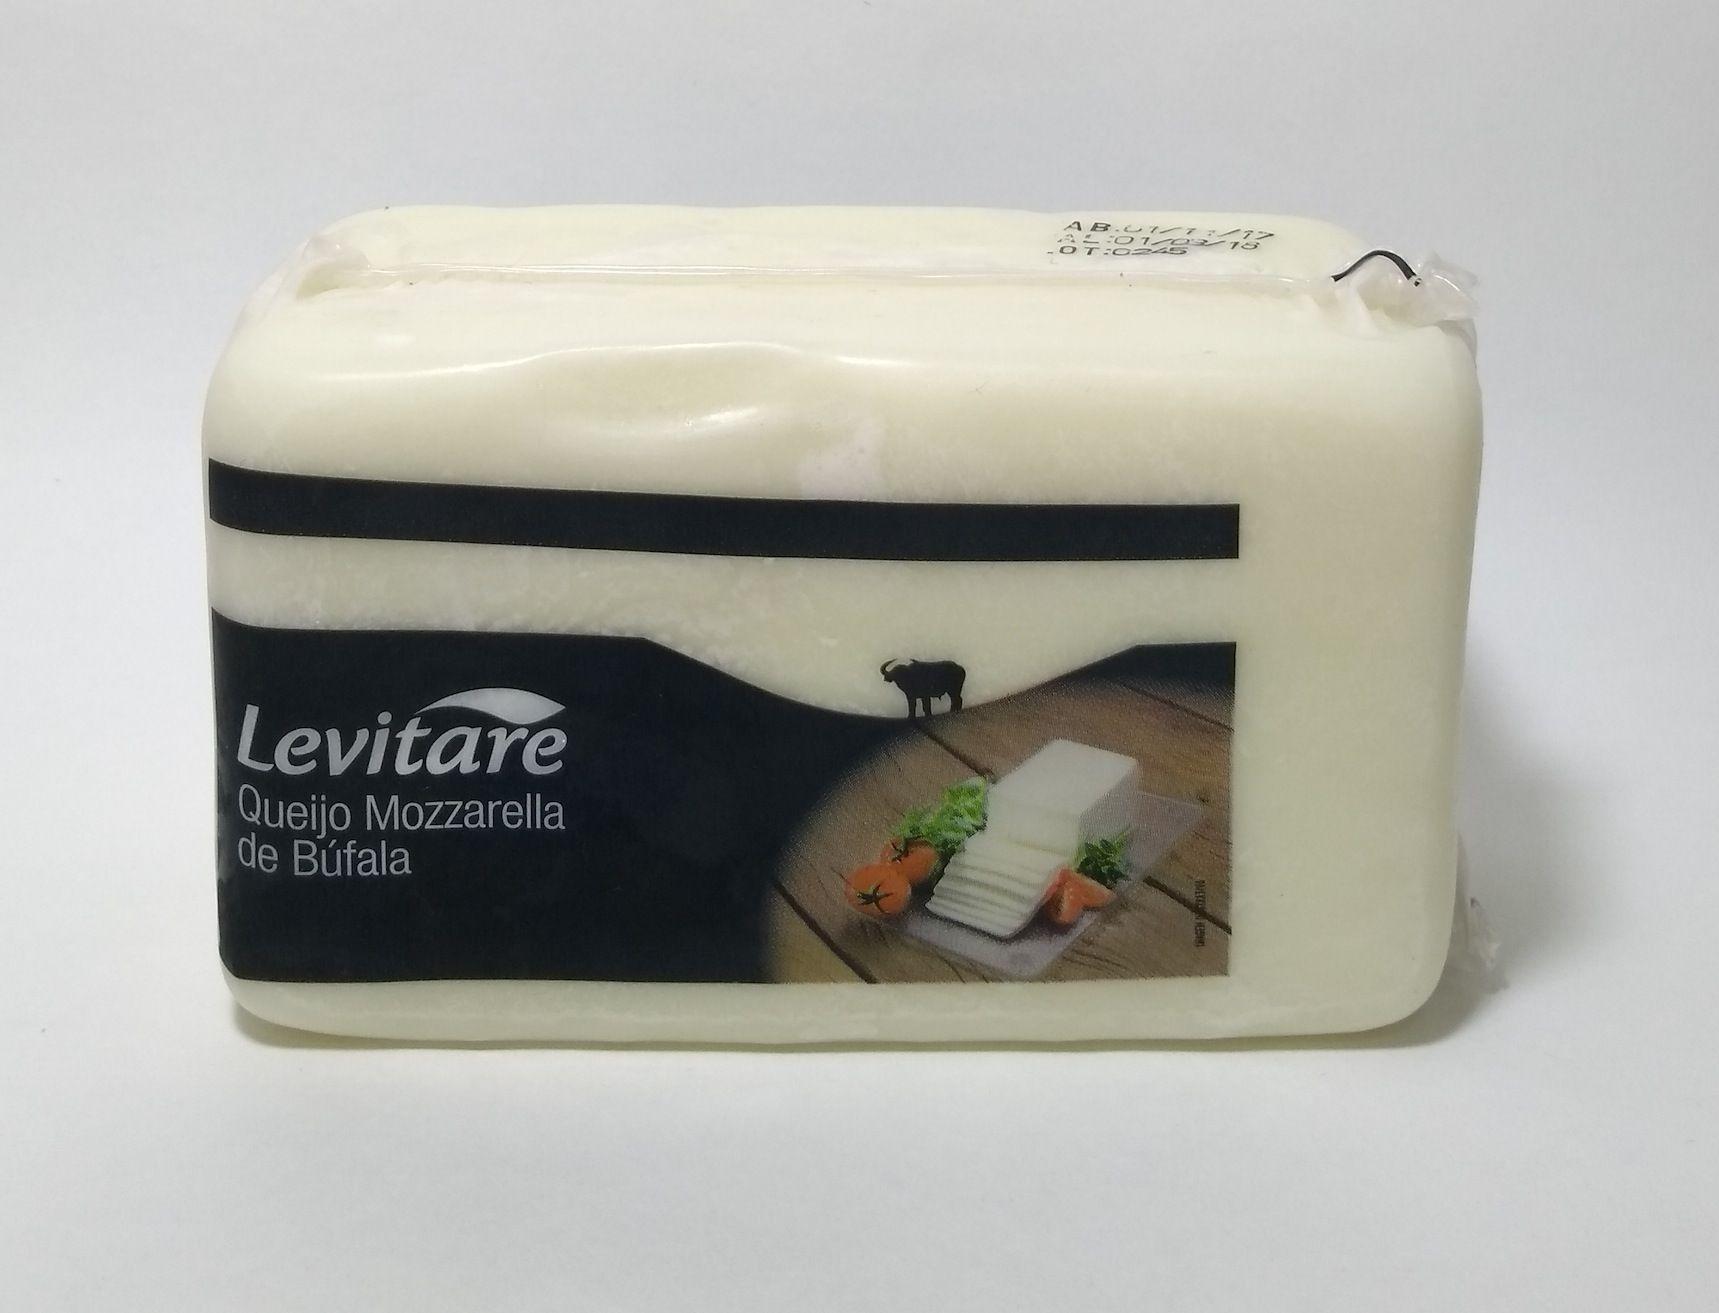 Queijo mozzarella de búfala – Levitare